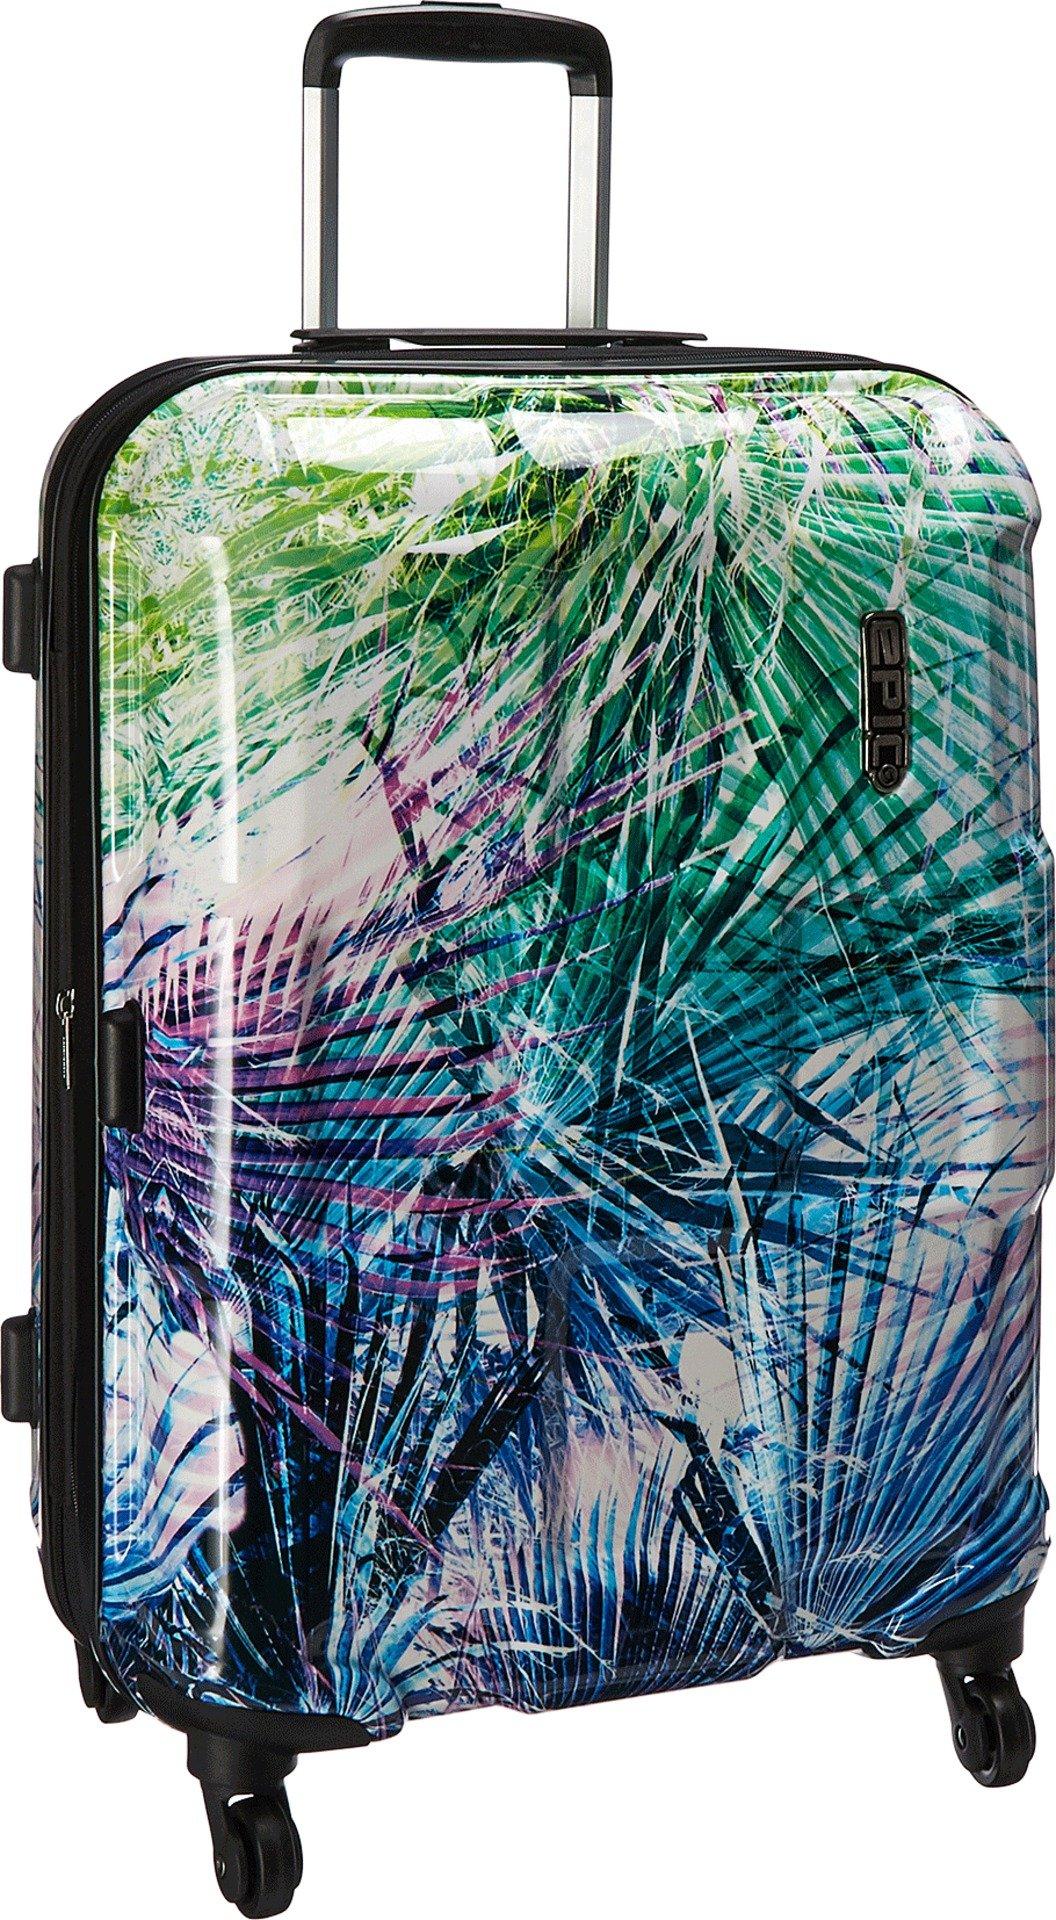 EPIC Travelgear Unisex Crate Wildlife EX 26'' Trolley Summer Shade Luggage